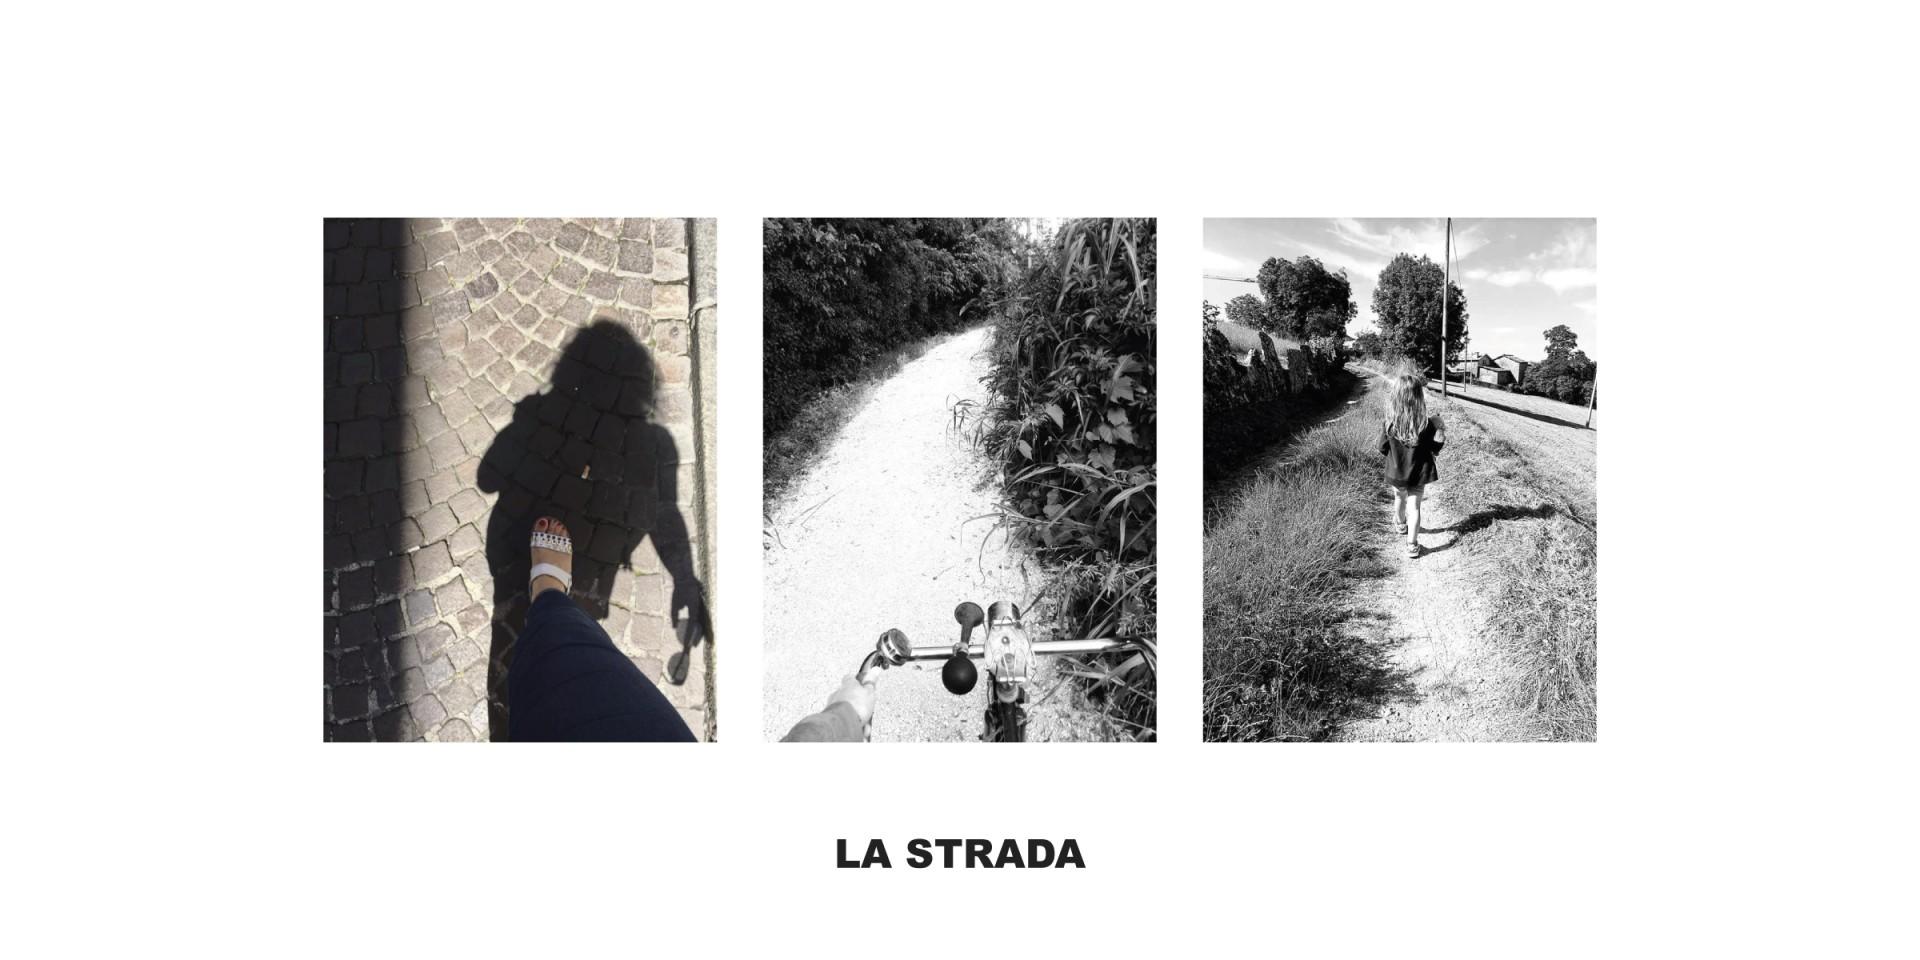 01-slide-la-strada-3.jpg